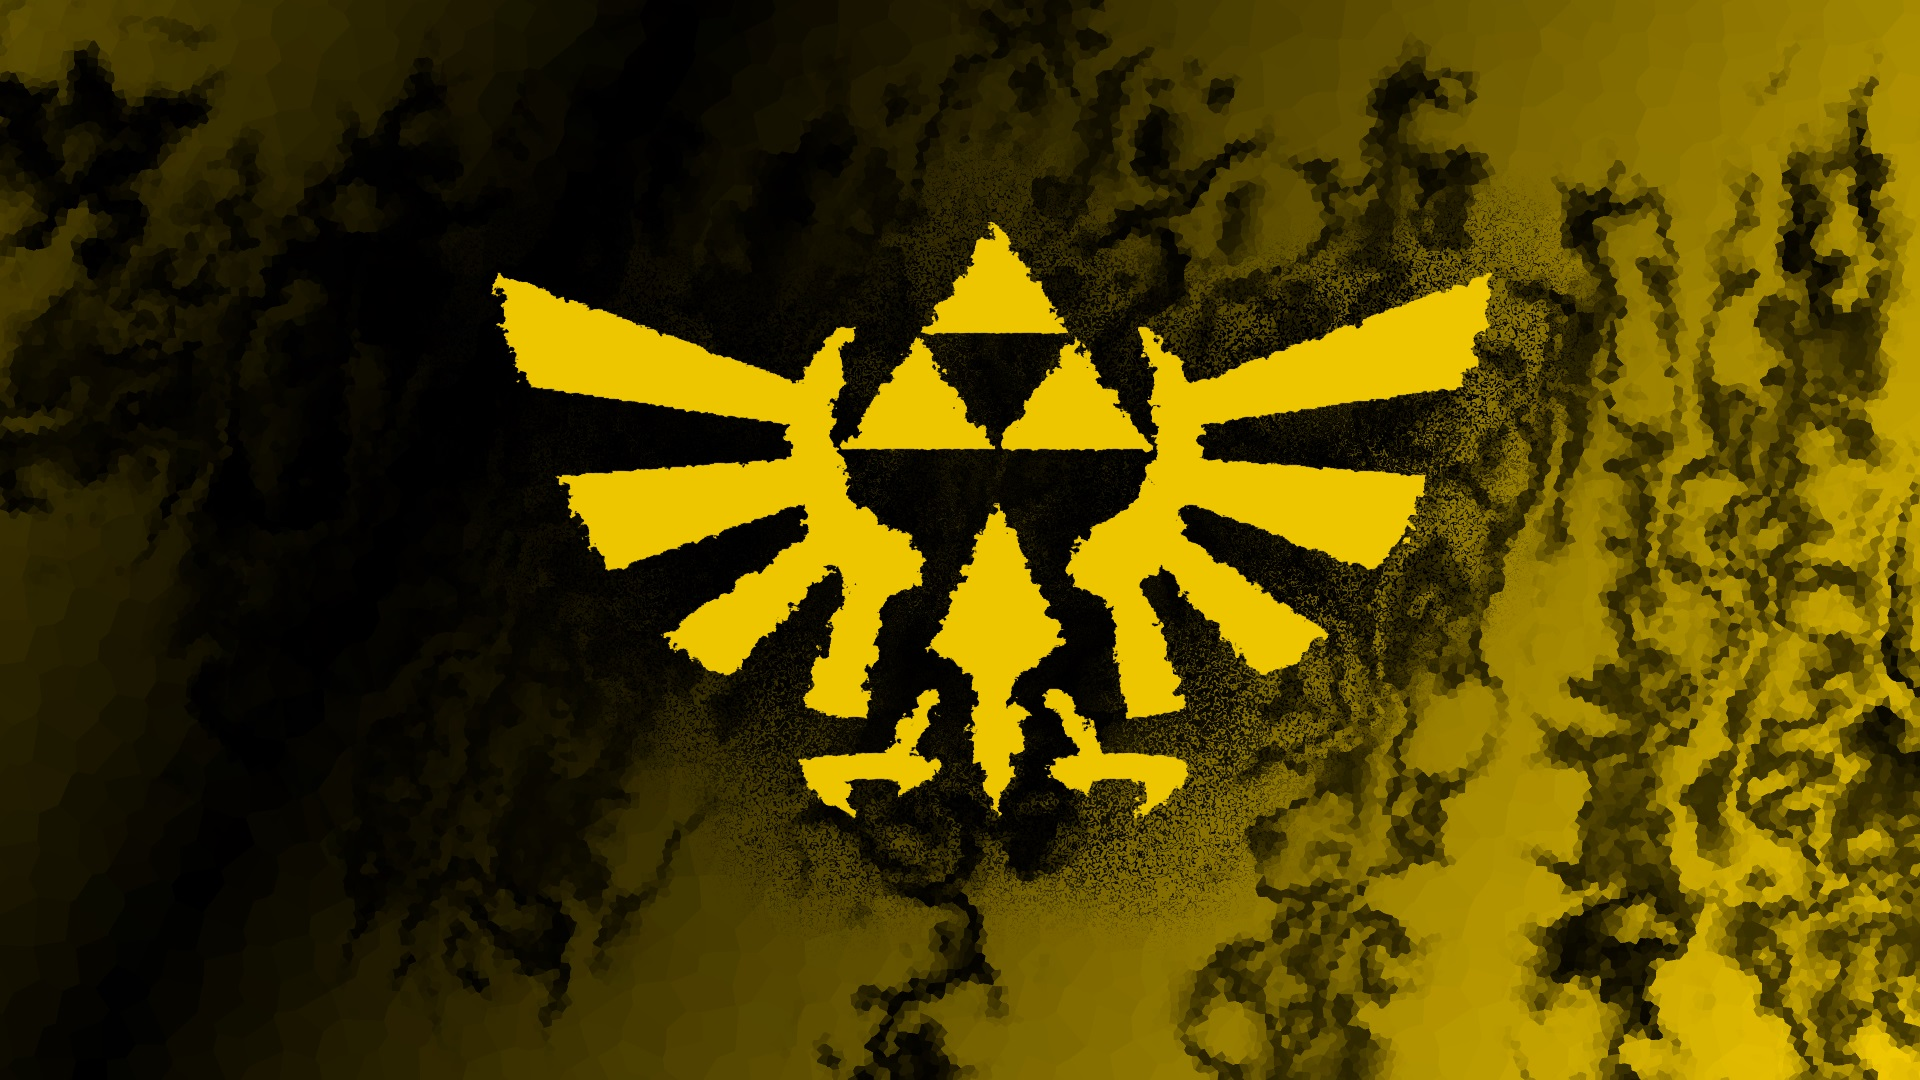 Cute Images For Computer Wallpaper Zelda Logo Wallpaper Pixelstalk Net